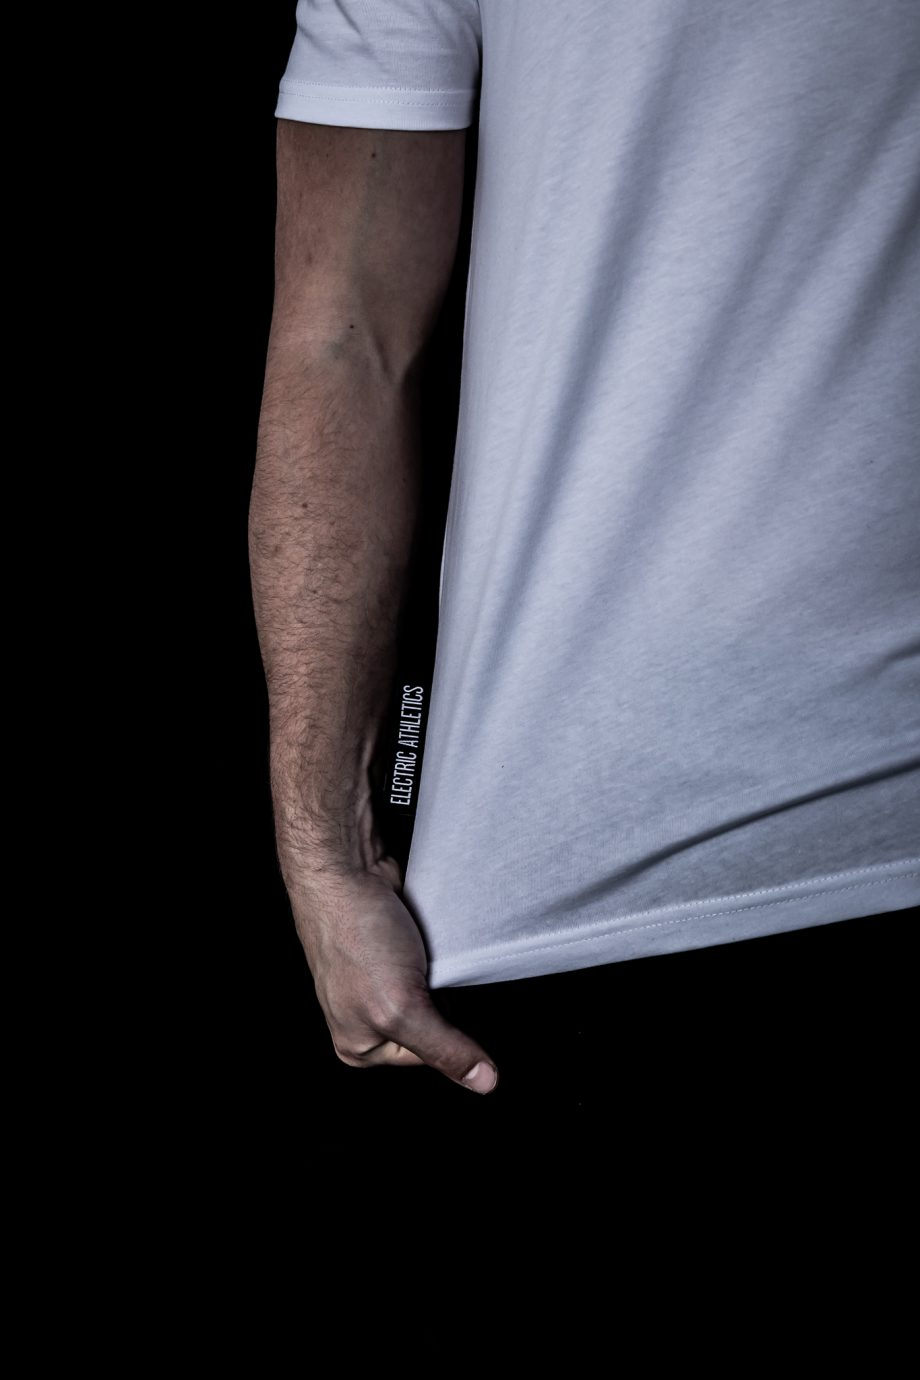 volt shirt side detail